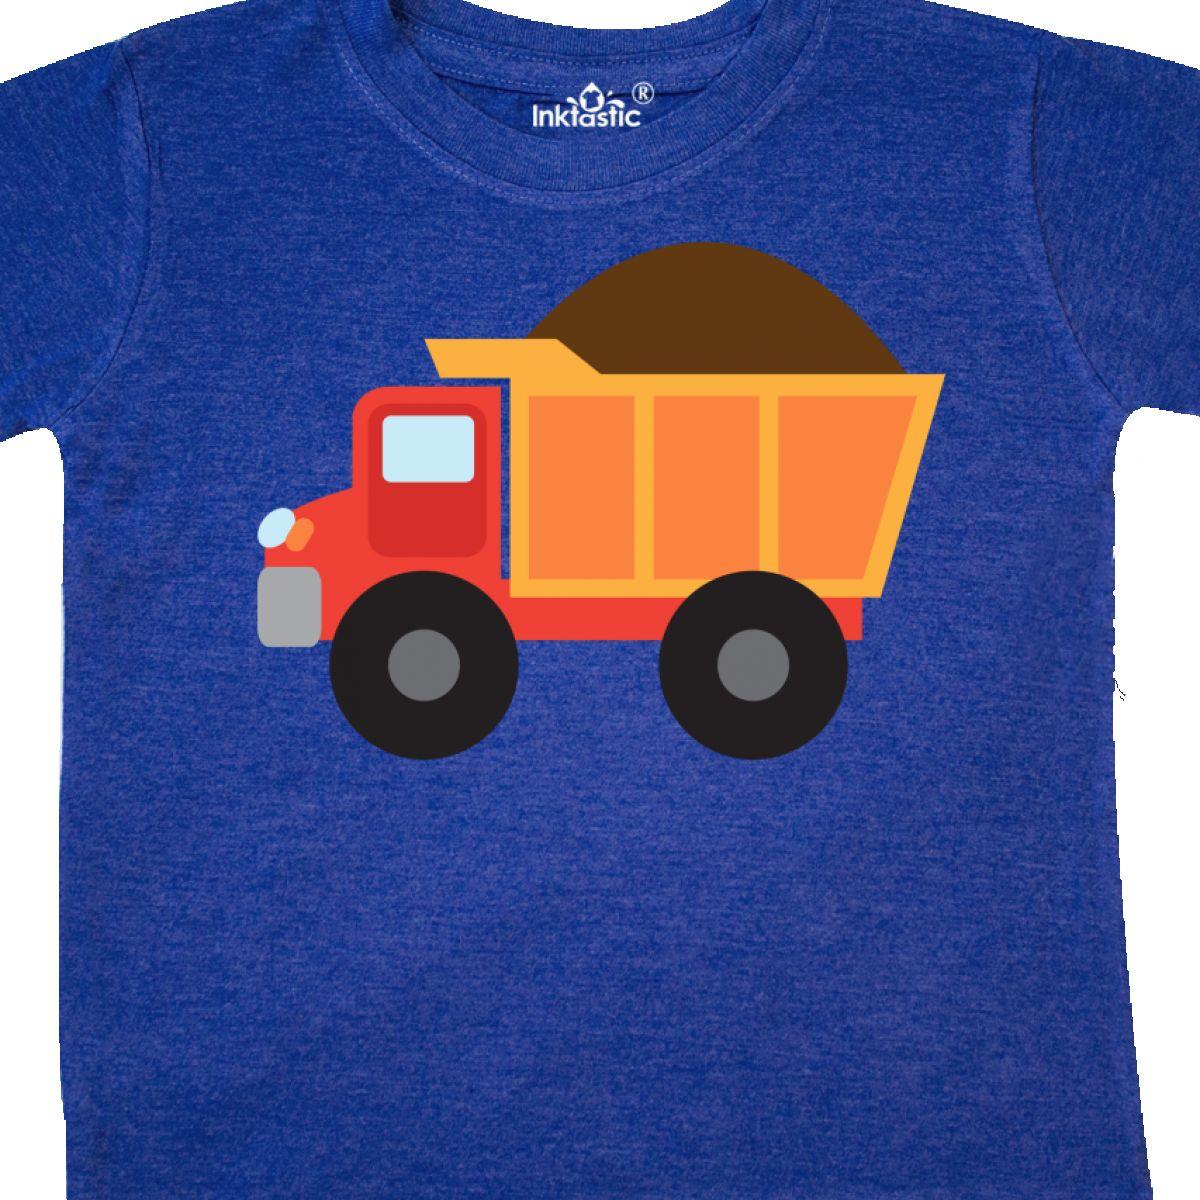 Inktastic-Work-Truck-Construction-Vehicle-Toddler-T-Shirt-Trucks-Vehicles-Cute thumbnail 30